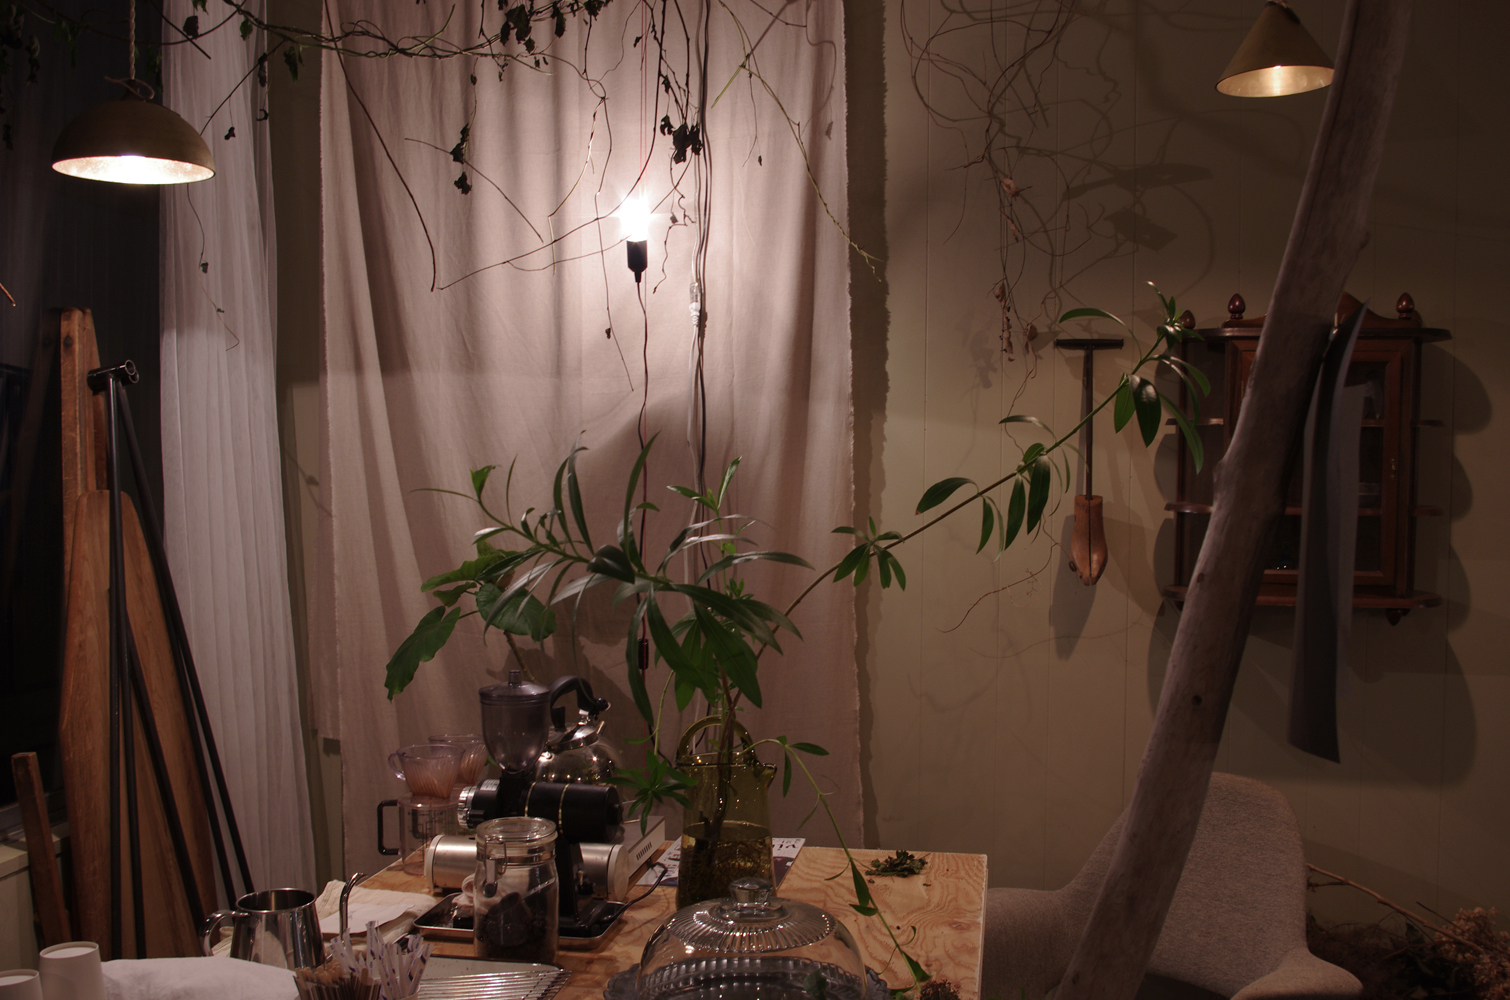 tipura-studio-ironworks-exhibition-6